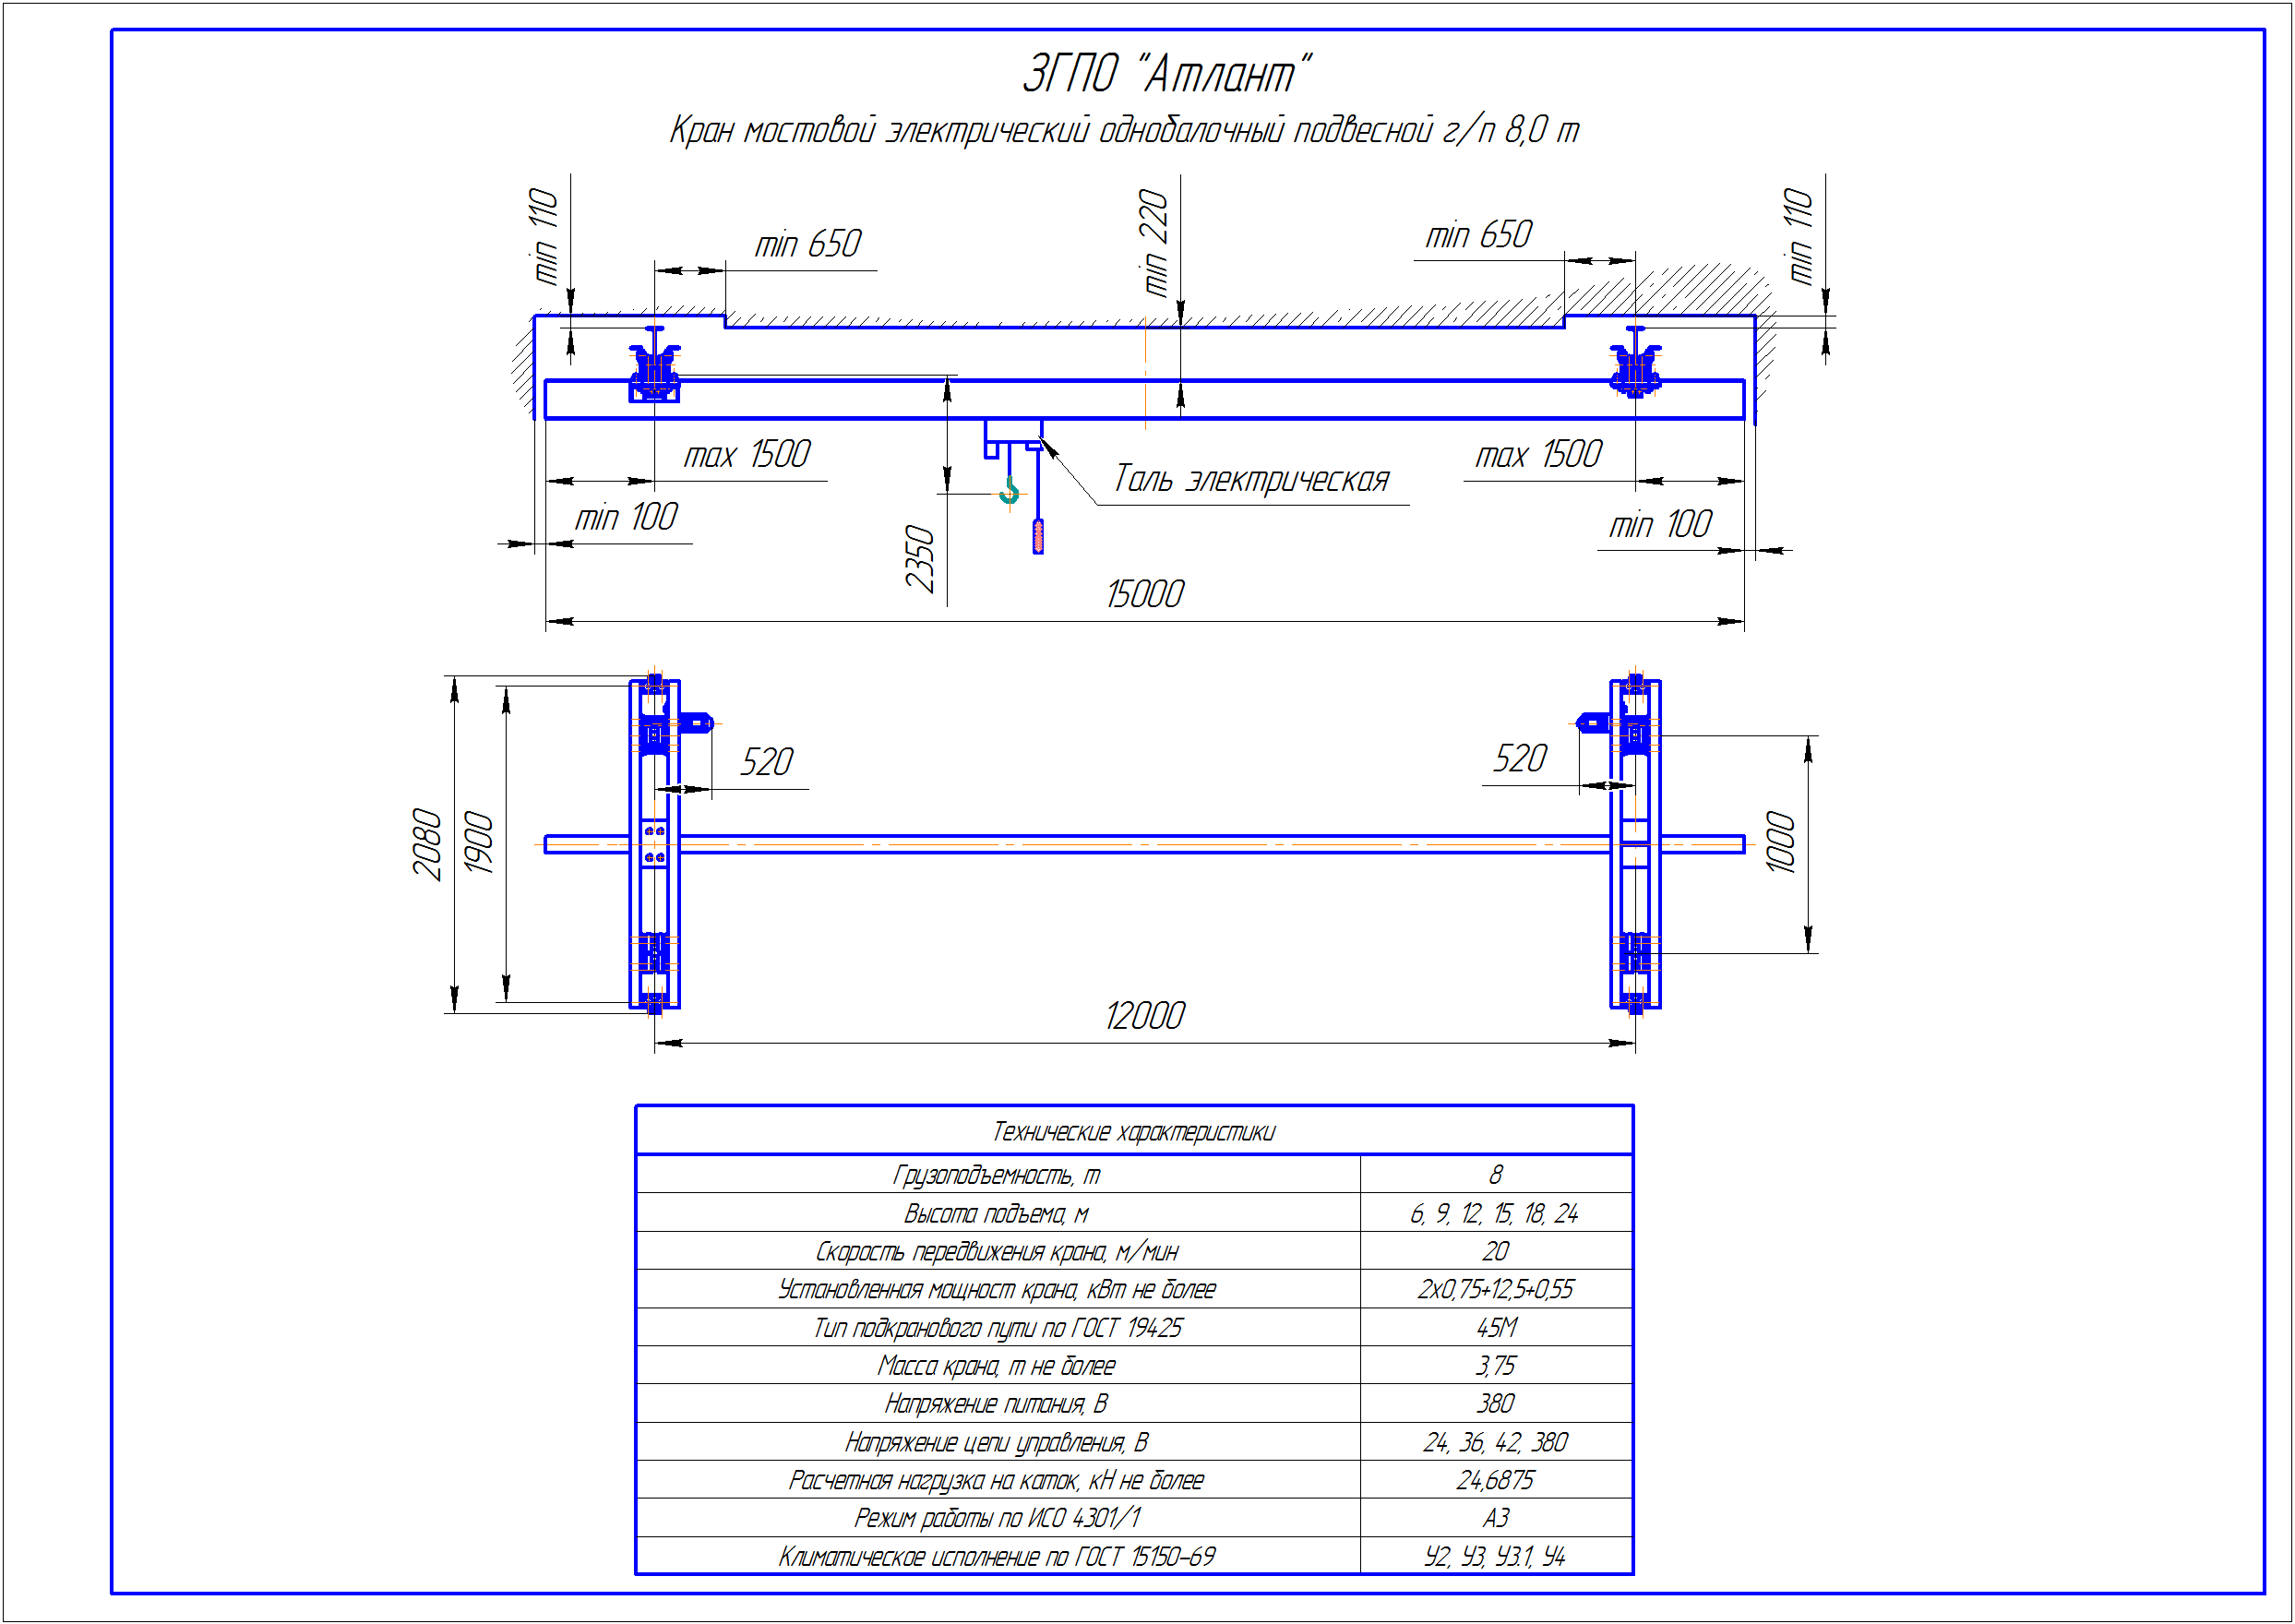 KBP 6 4 - Подвесная кран балка